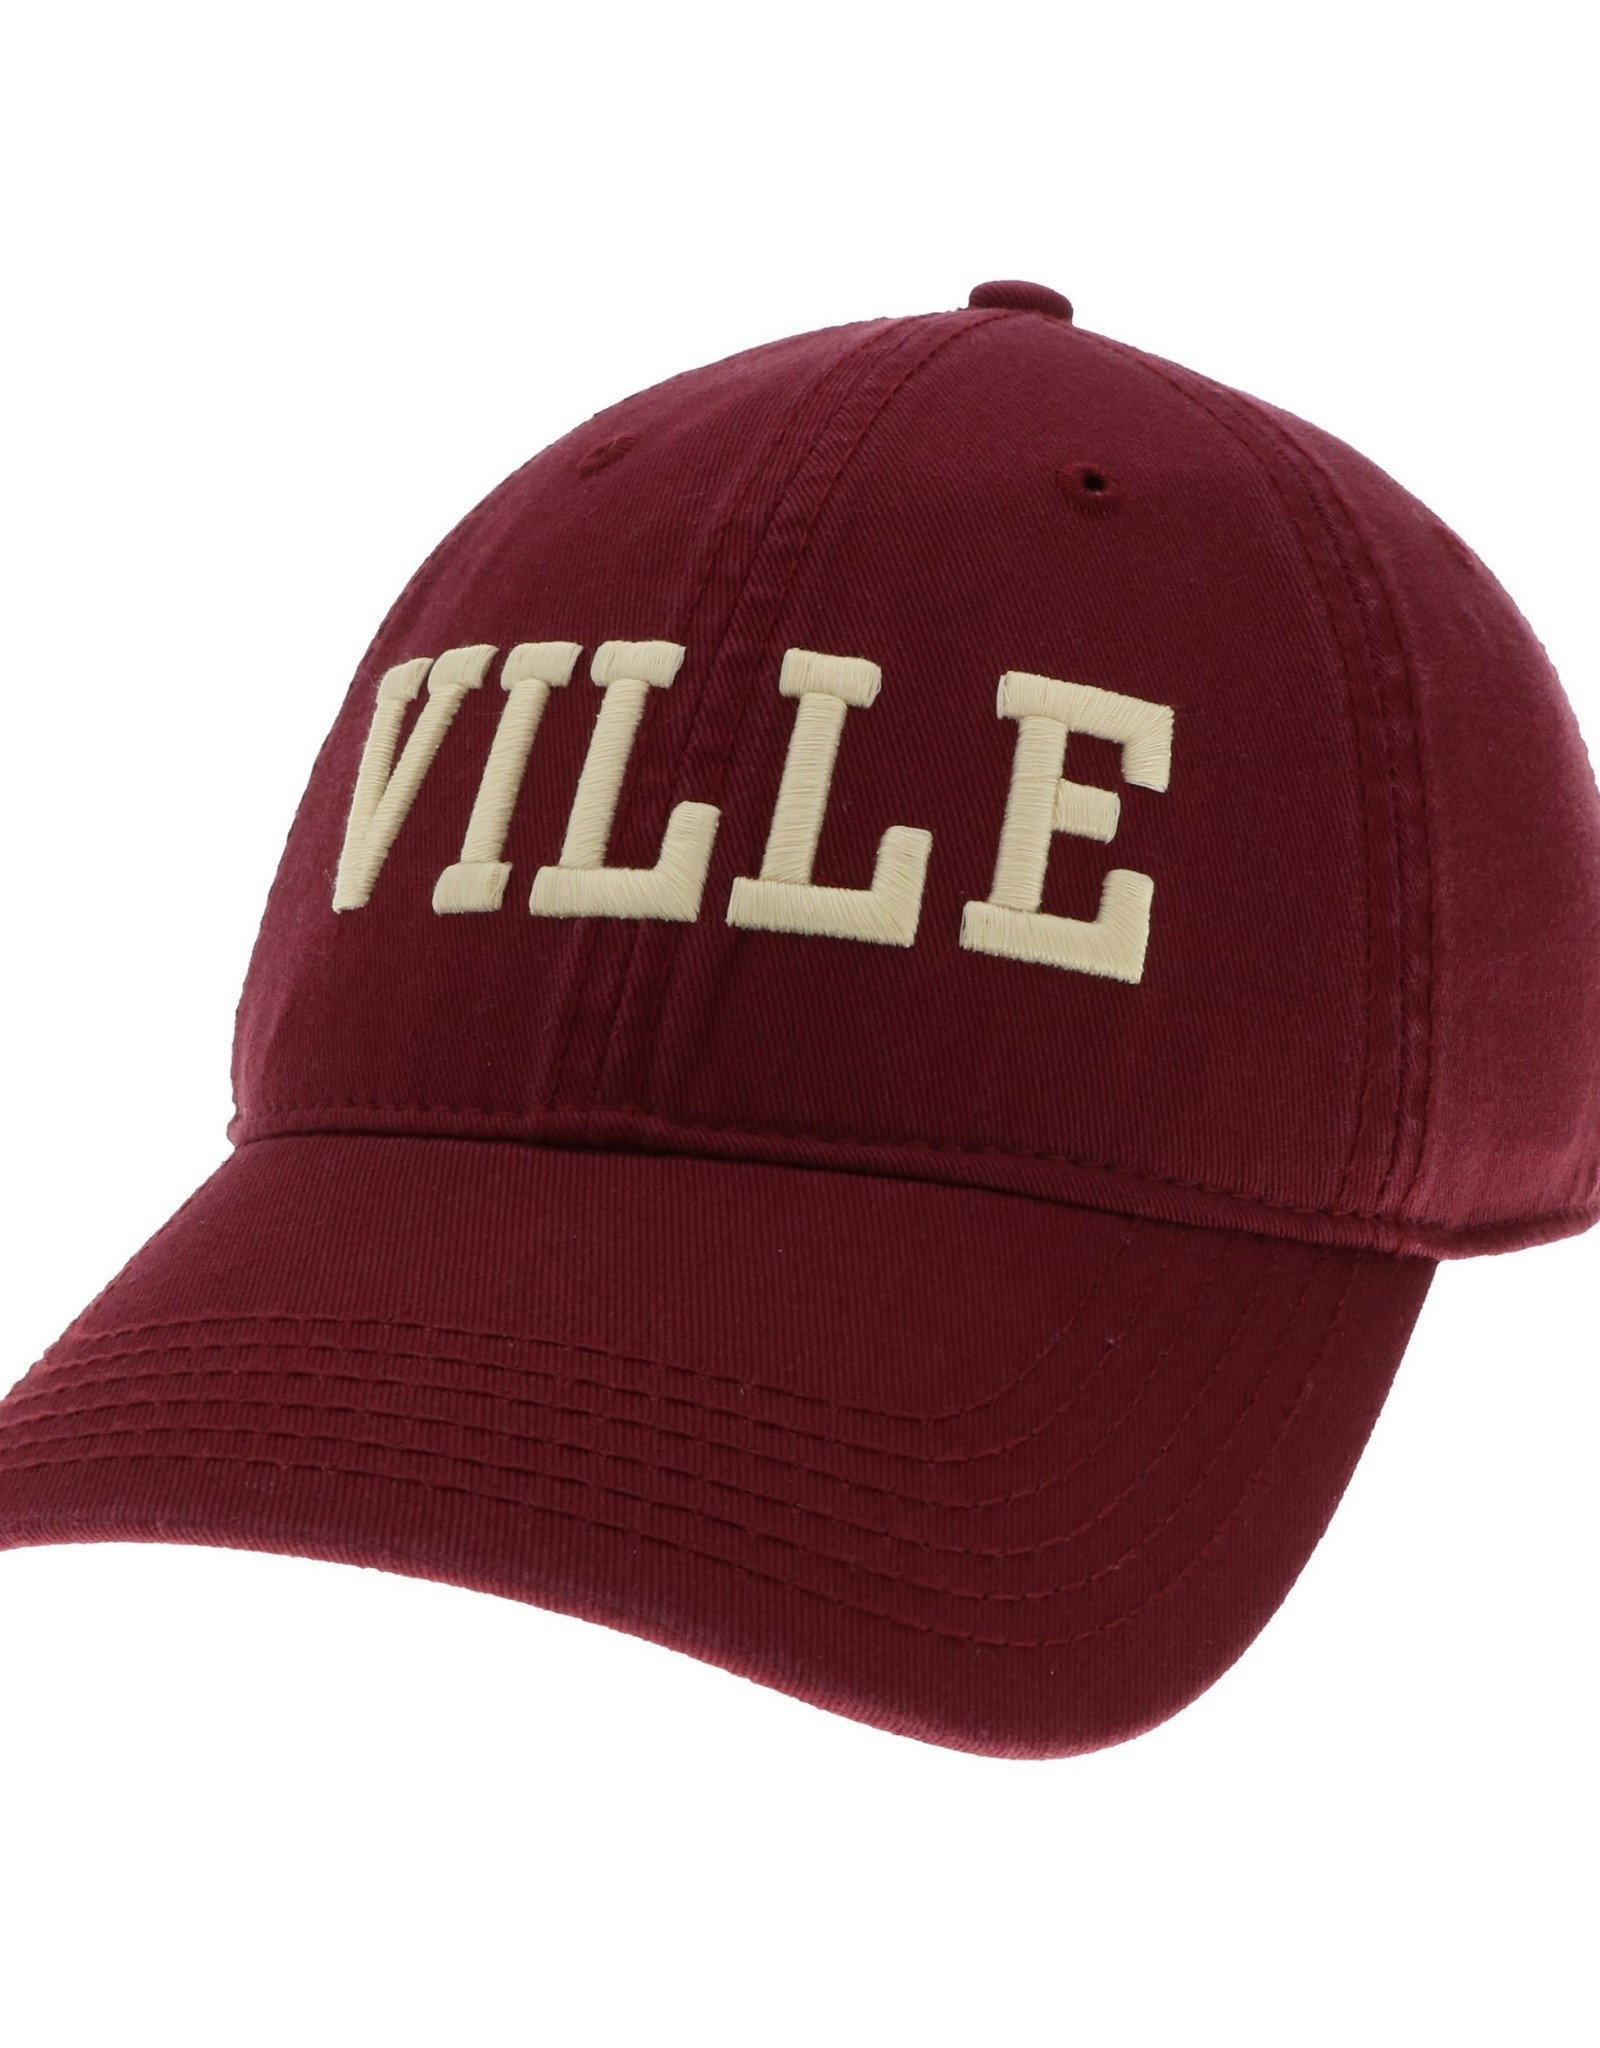 Burgandy Ville Cap